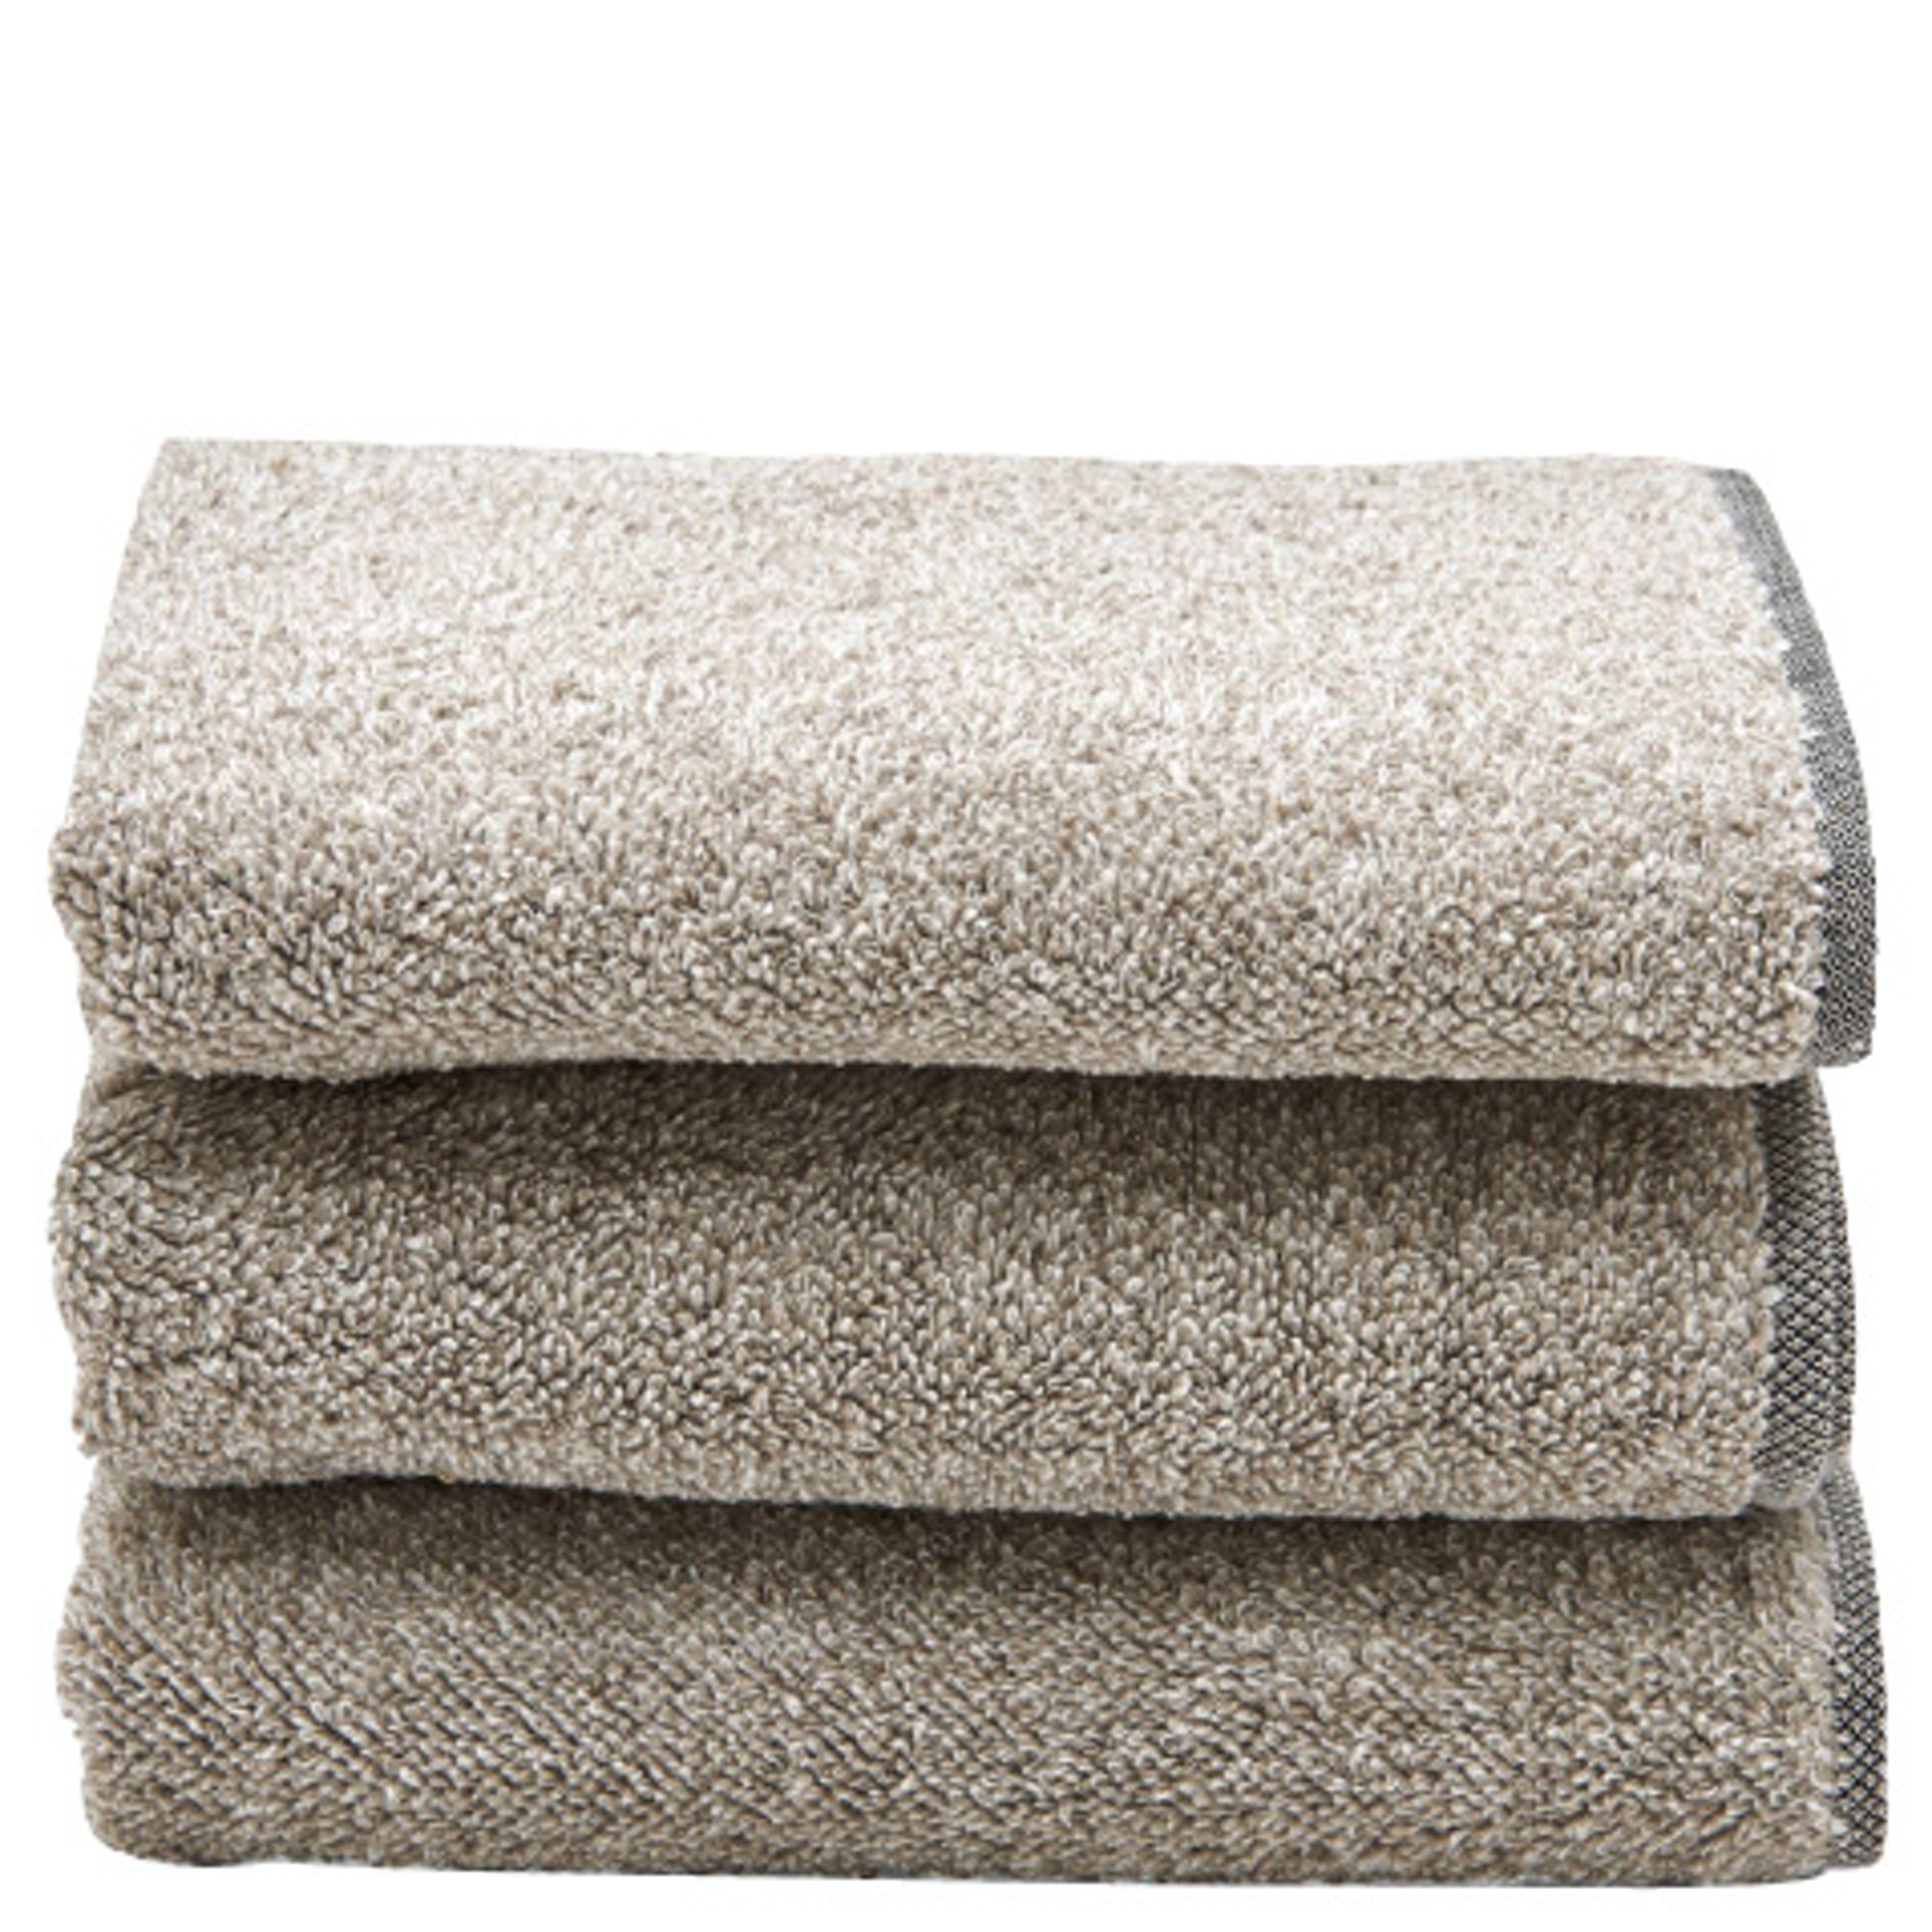 Tasha Hand Towel Black/Linen